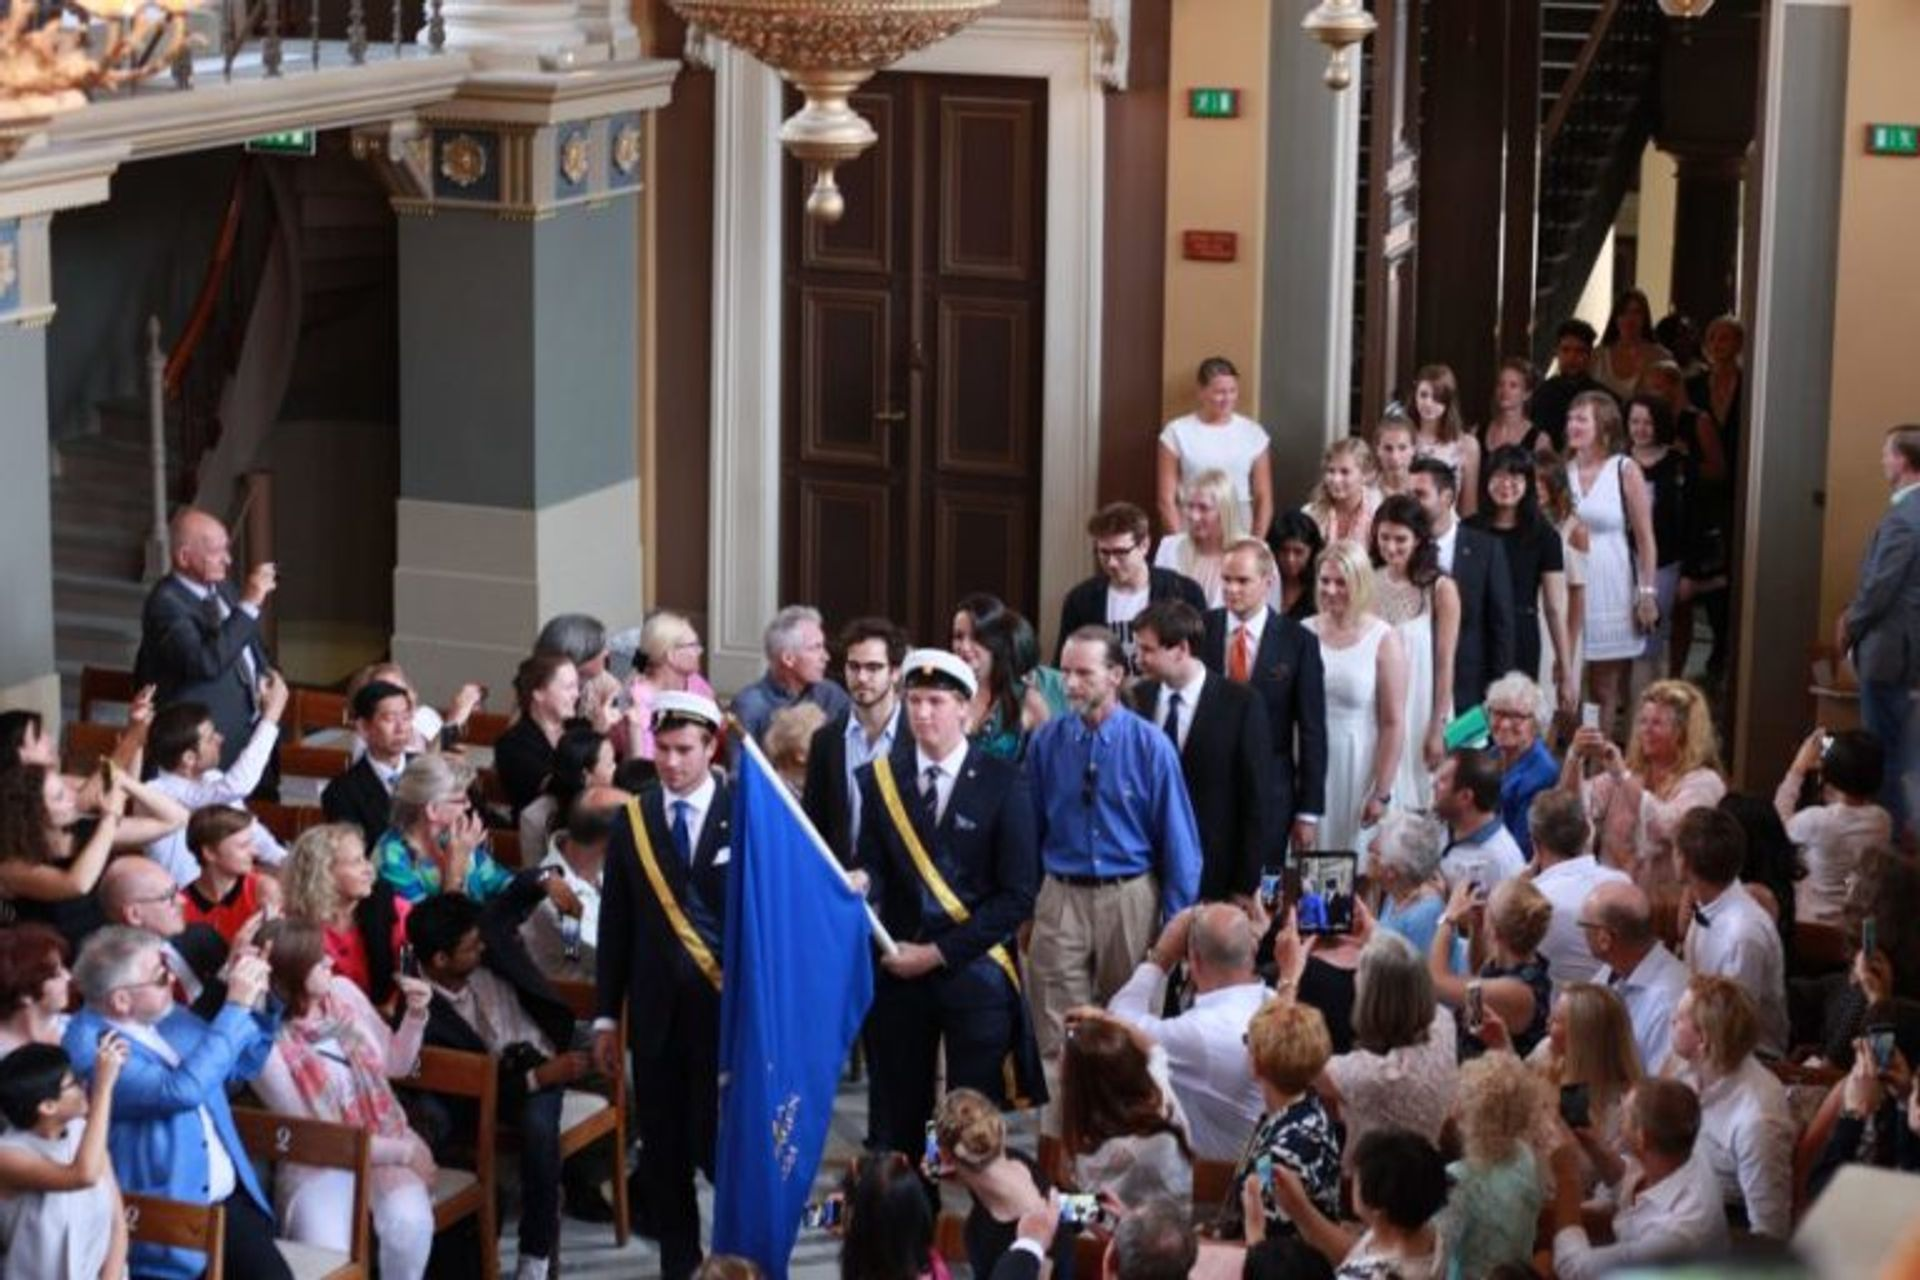 Students at a graduation ceremony.